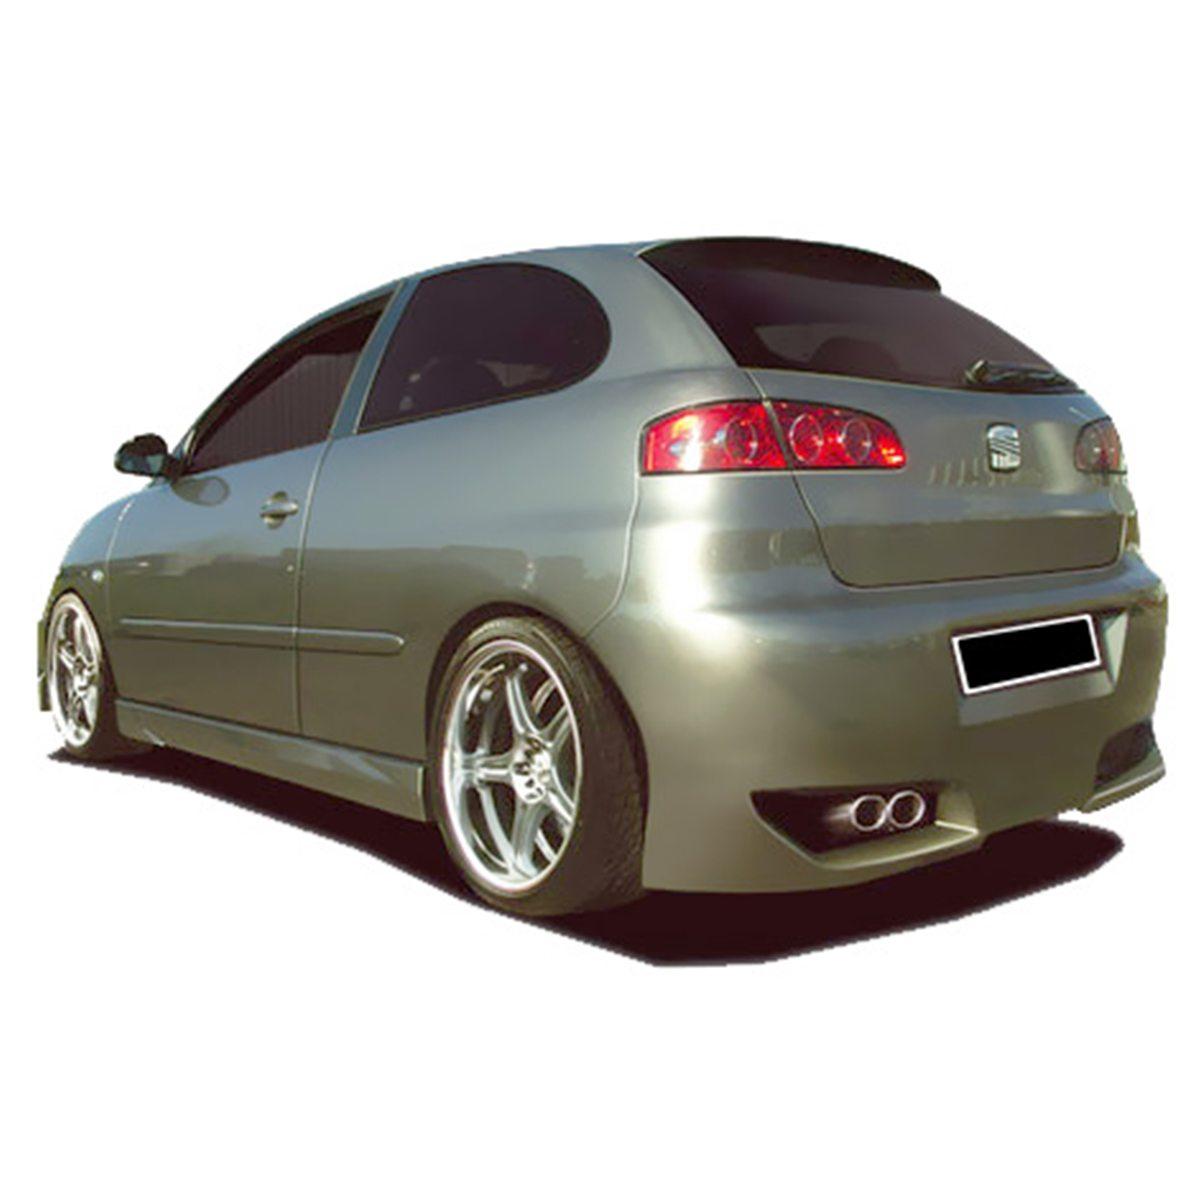 Seat-Ibiza-2003-Mars-Tras-PCN108